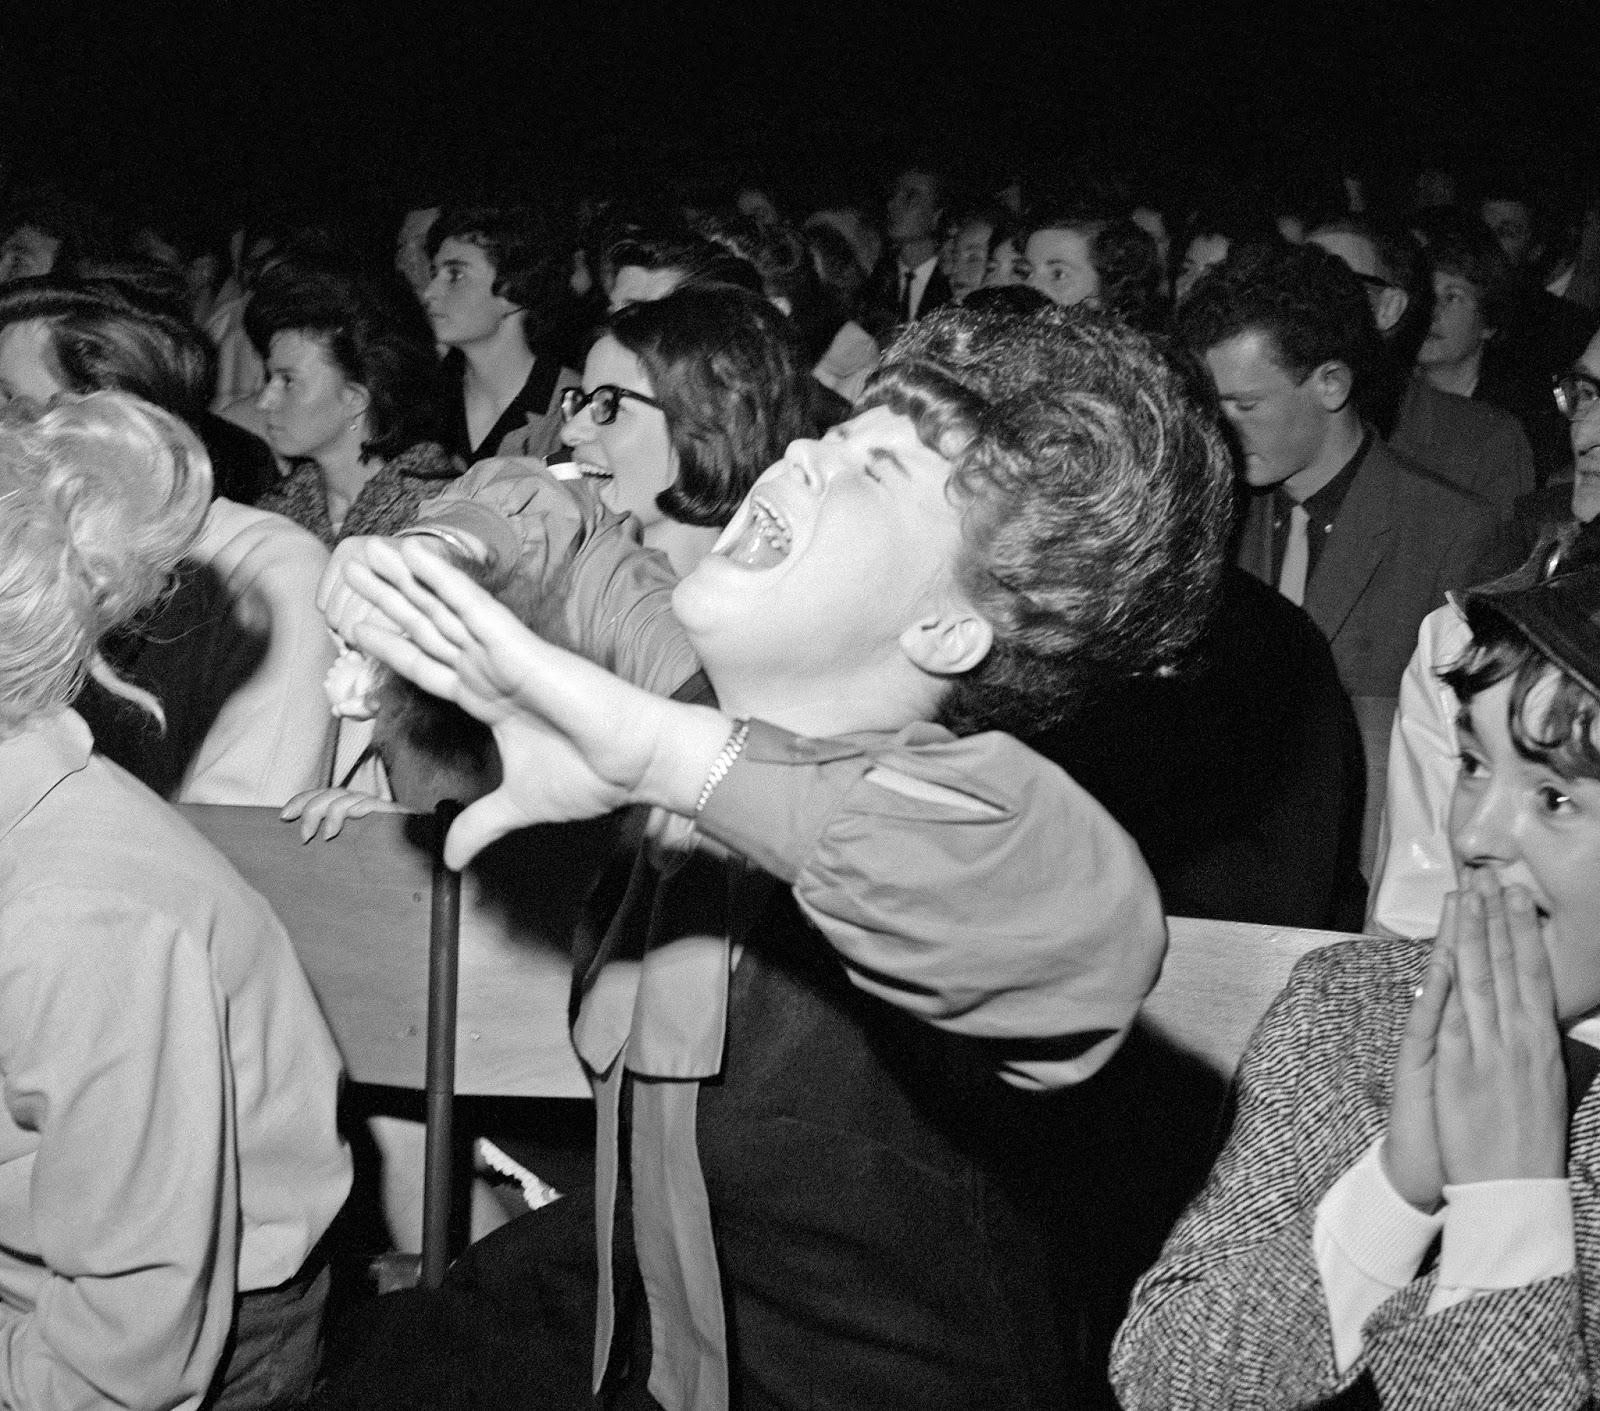 ãbeatles new zealand concert 1964ãã®ç»åæ¤ç´¢çµæ